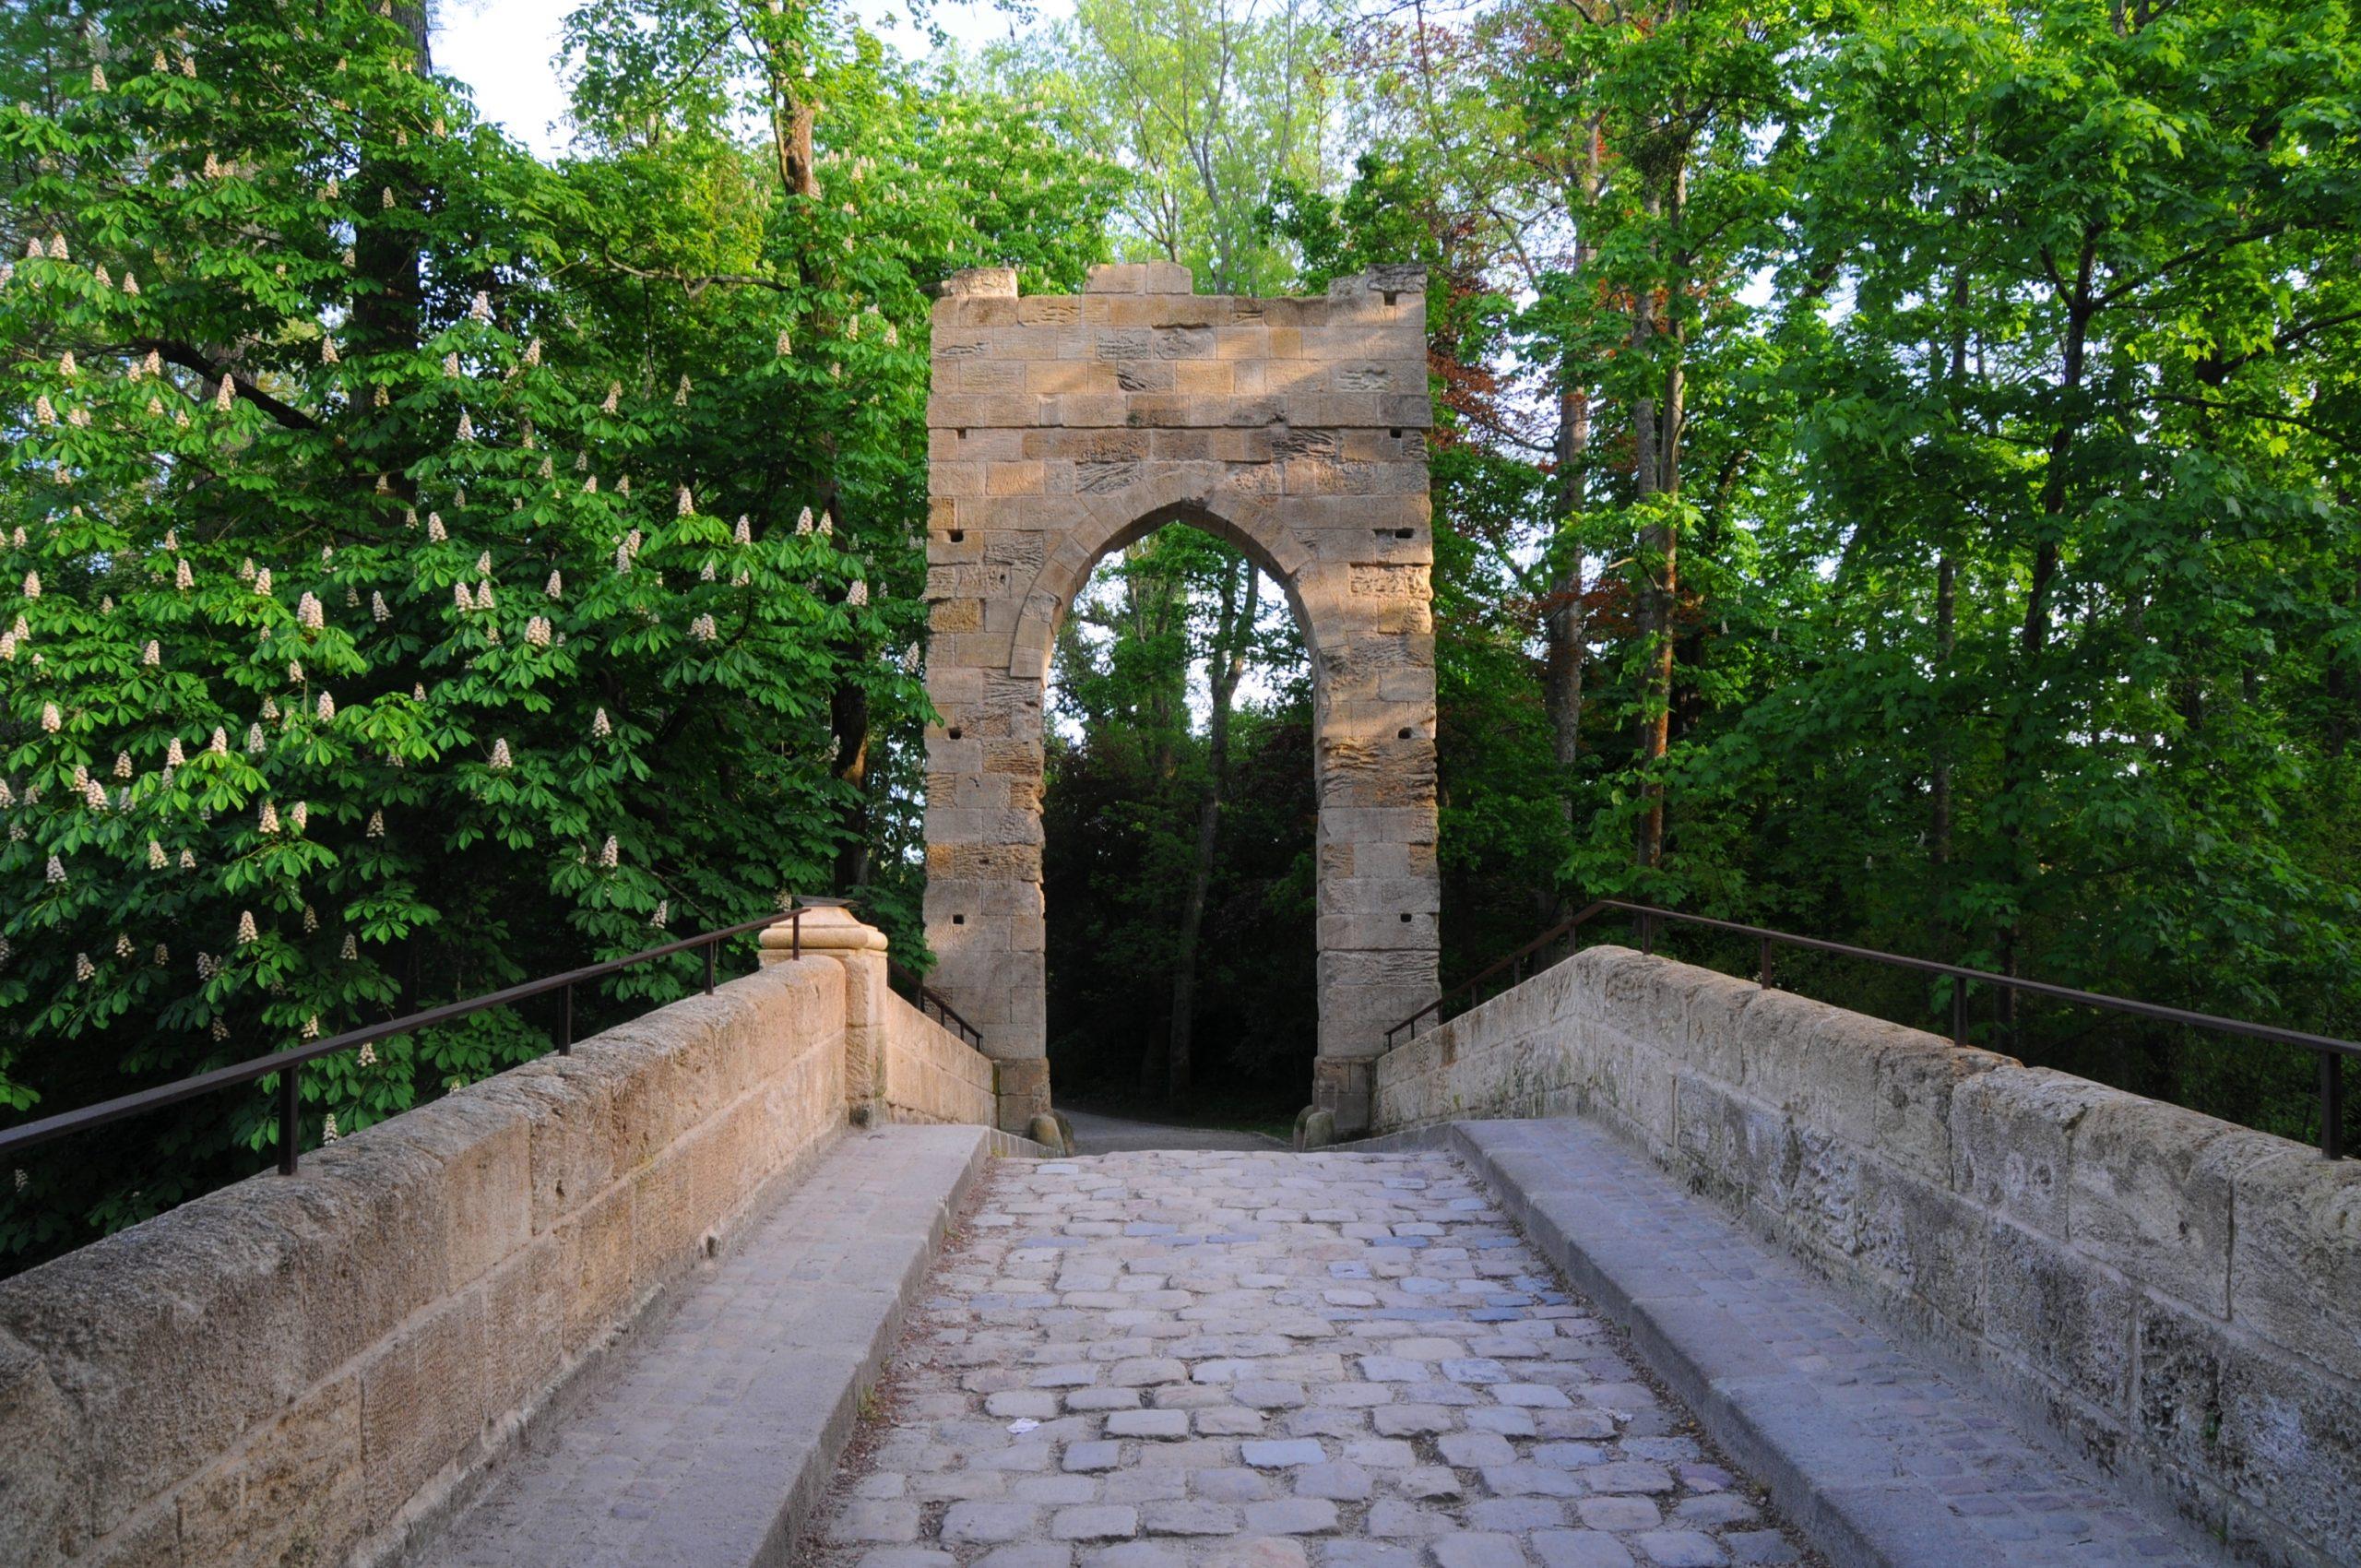 Parc-de-Bourran-Ville-de-Merignac-2-2